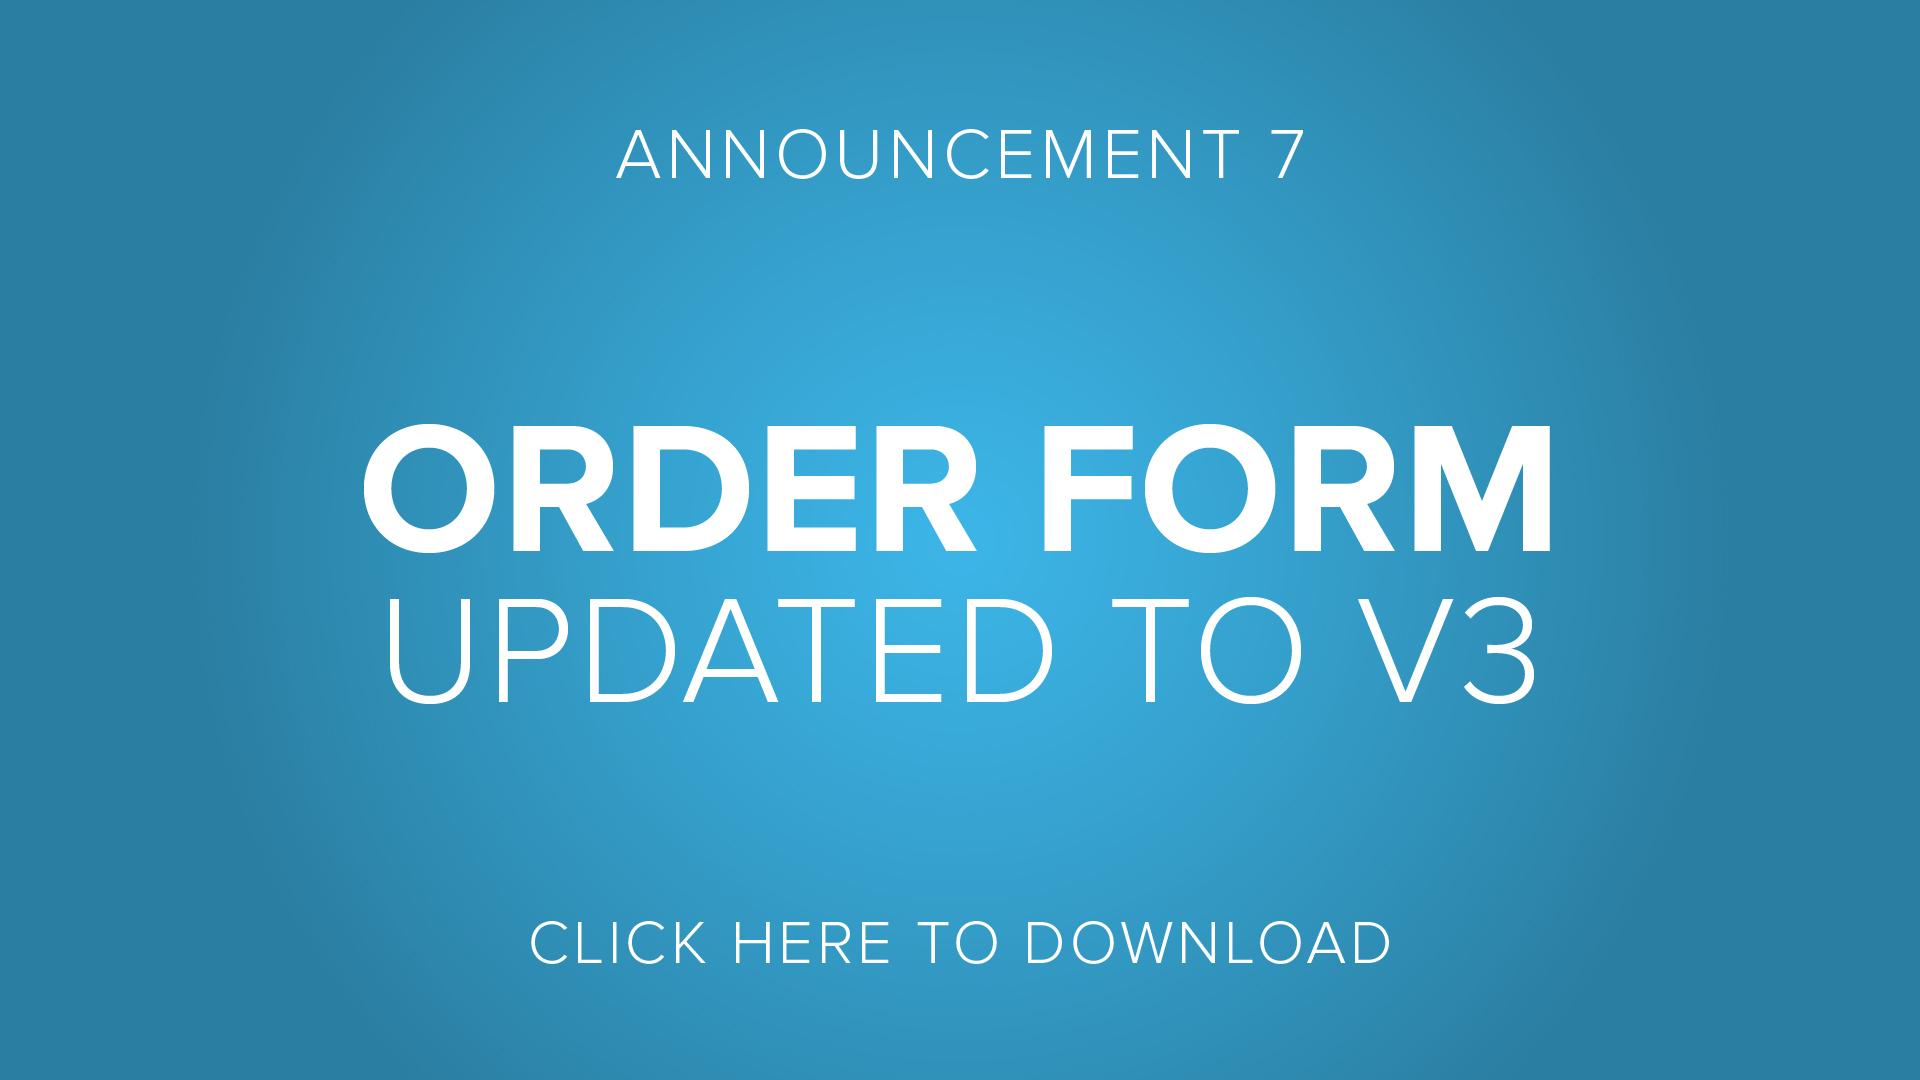 Announcement Buttons_02 Order Form copy.jpg